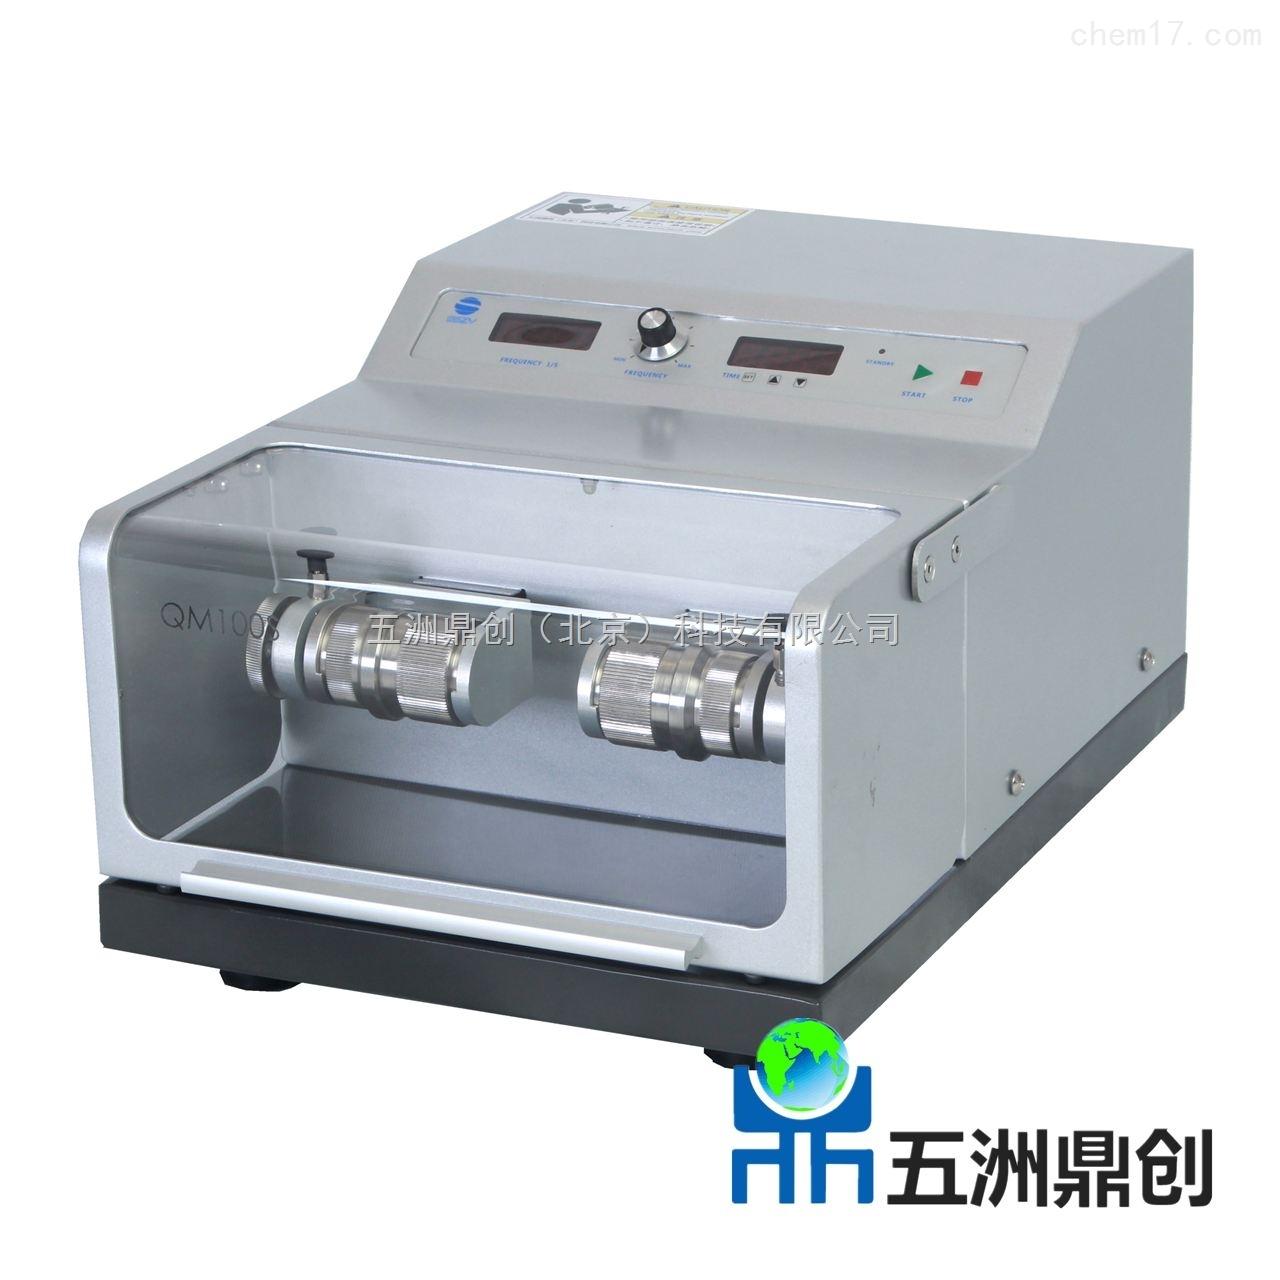 QM100北京直销旋转式研磨仪 混合研磨仪QM100系列